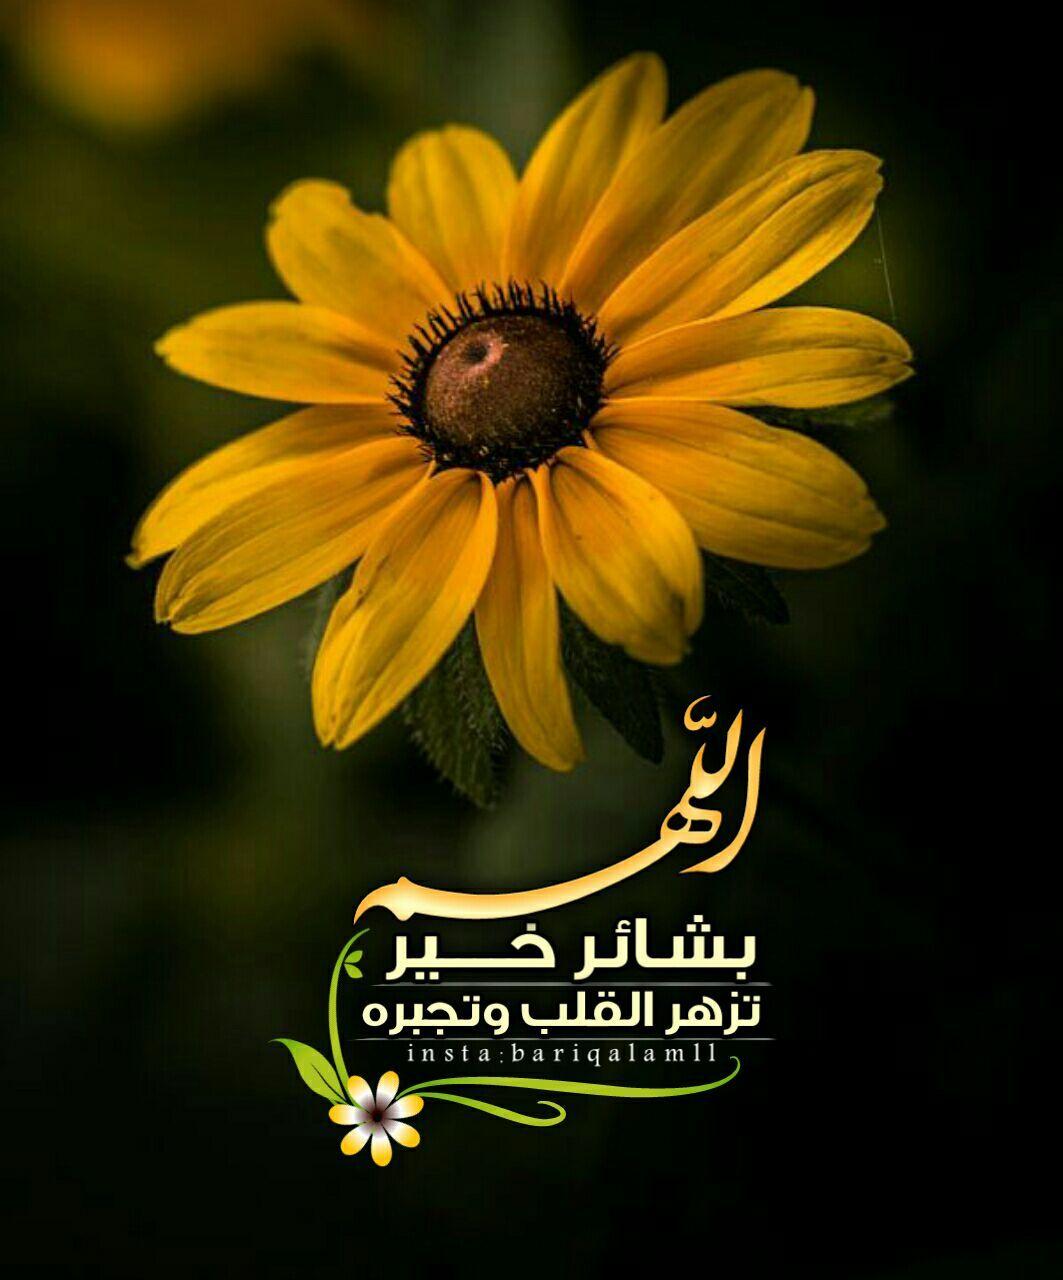 Pin By نشر الخير On أدعيه Islamic Quotes Quran Islamic Images Islamic Art Calligraphy